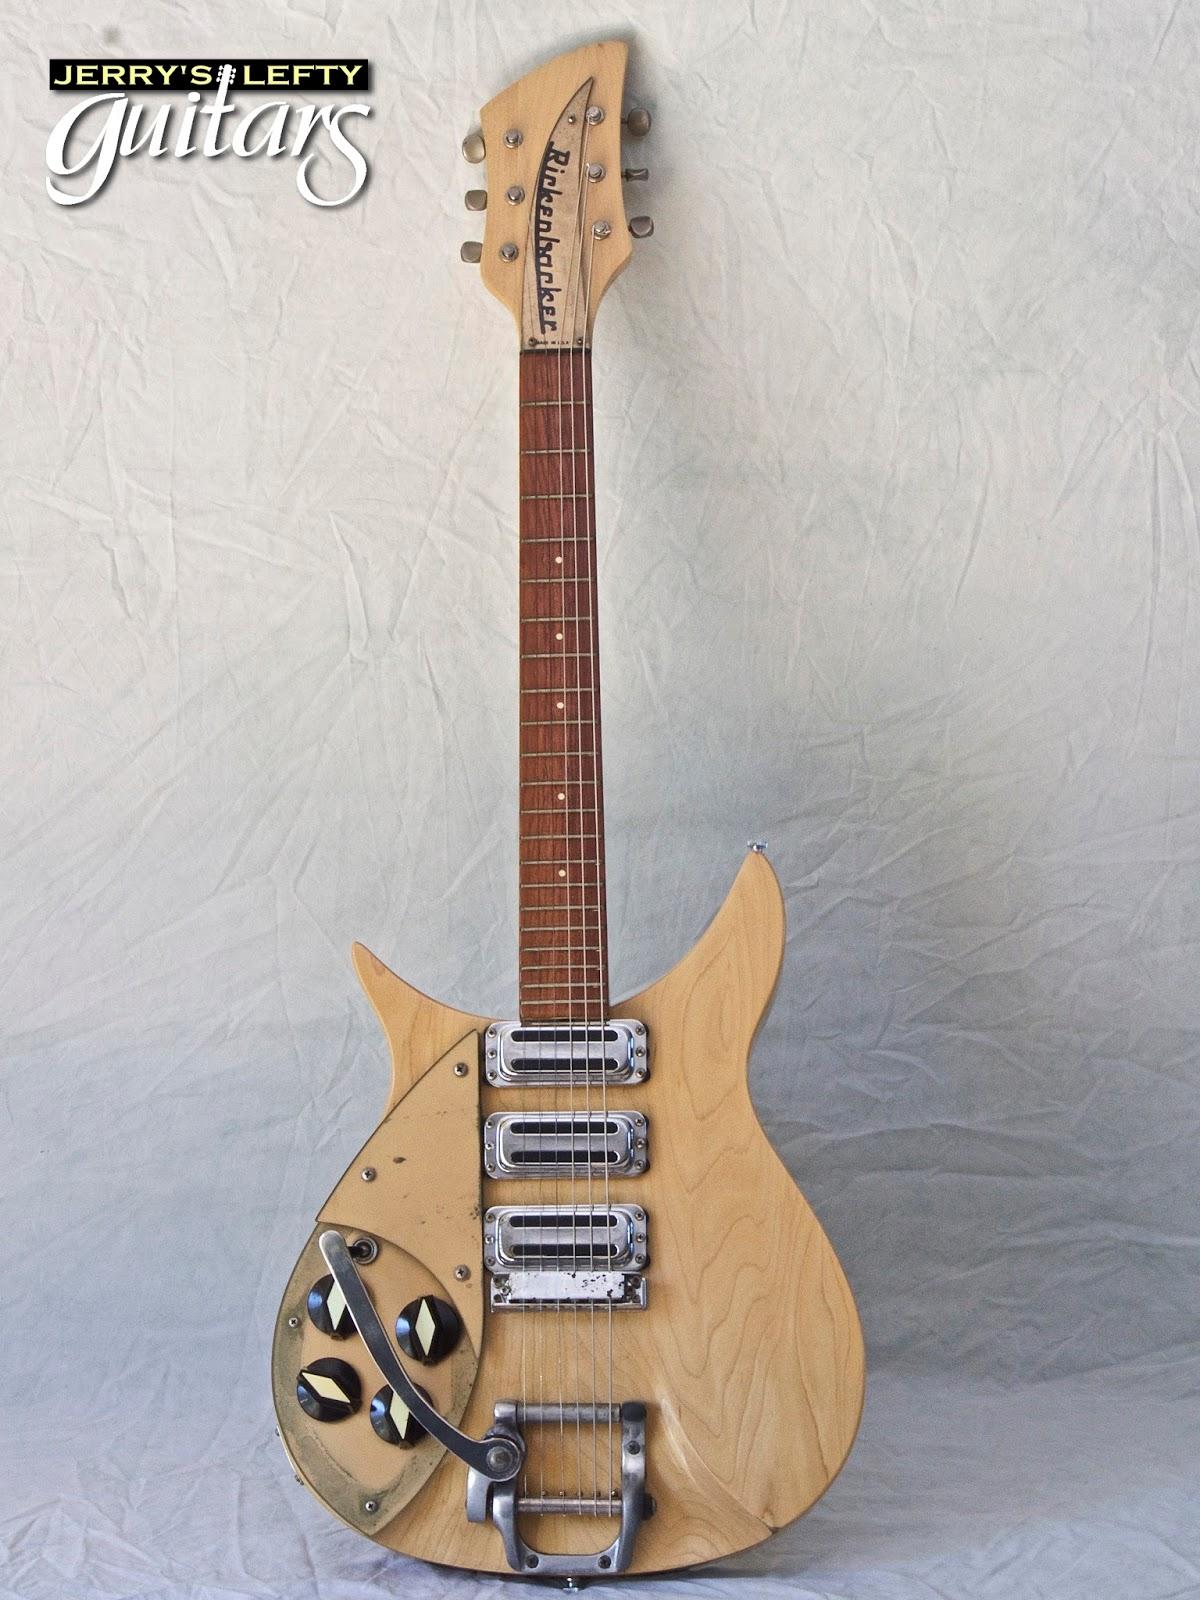 jerry 39 s lefty guitars newest guitar arrivals updated weekly 1986 rickenbacker 325v59 left. Black Bedroom Furniture Sets. Home Design Ideas